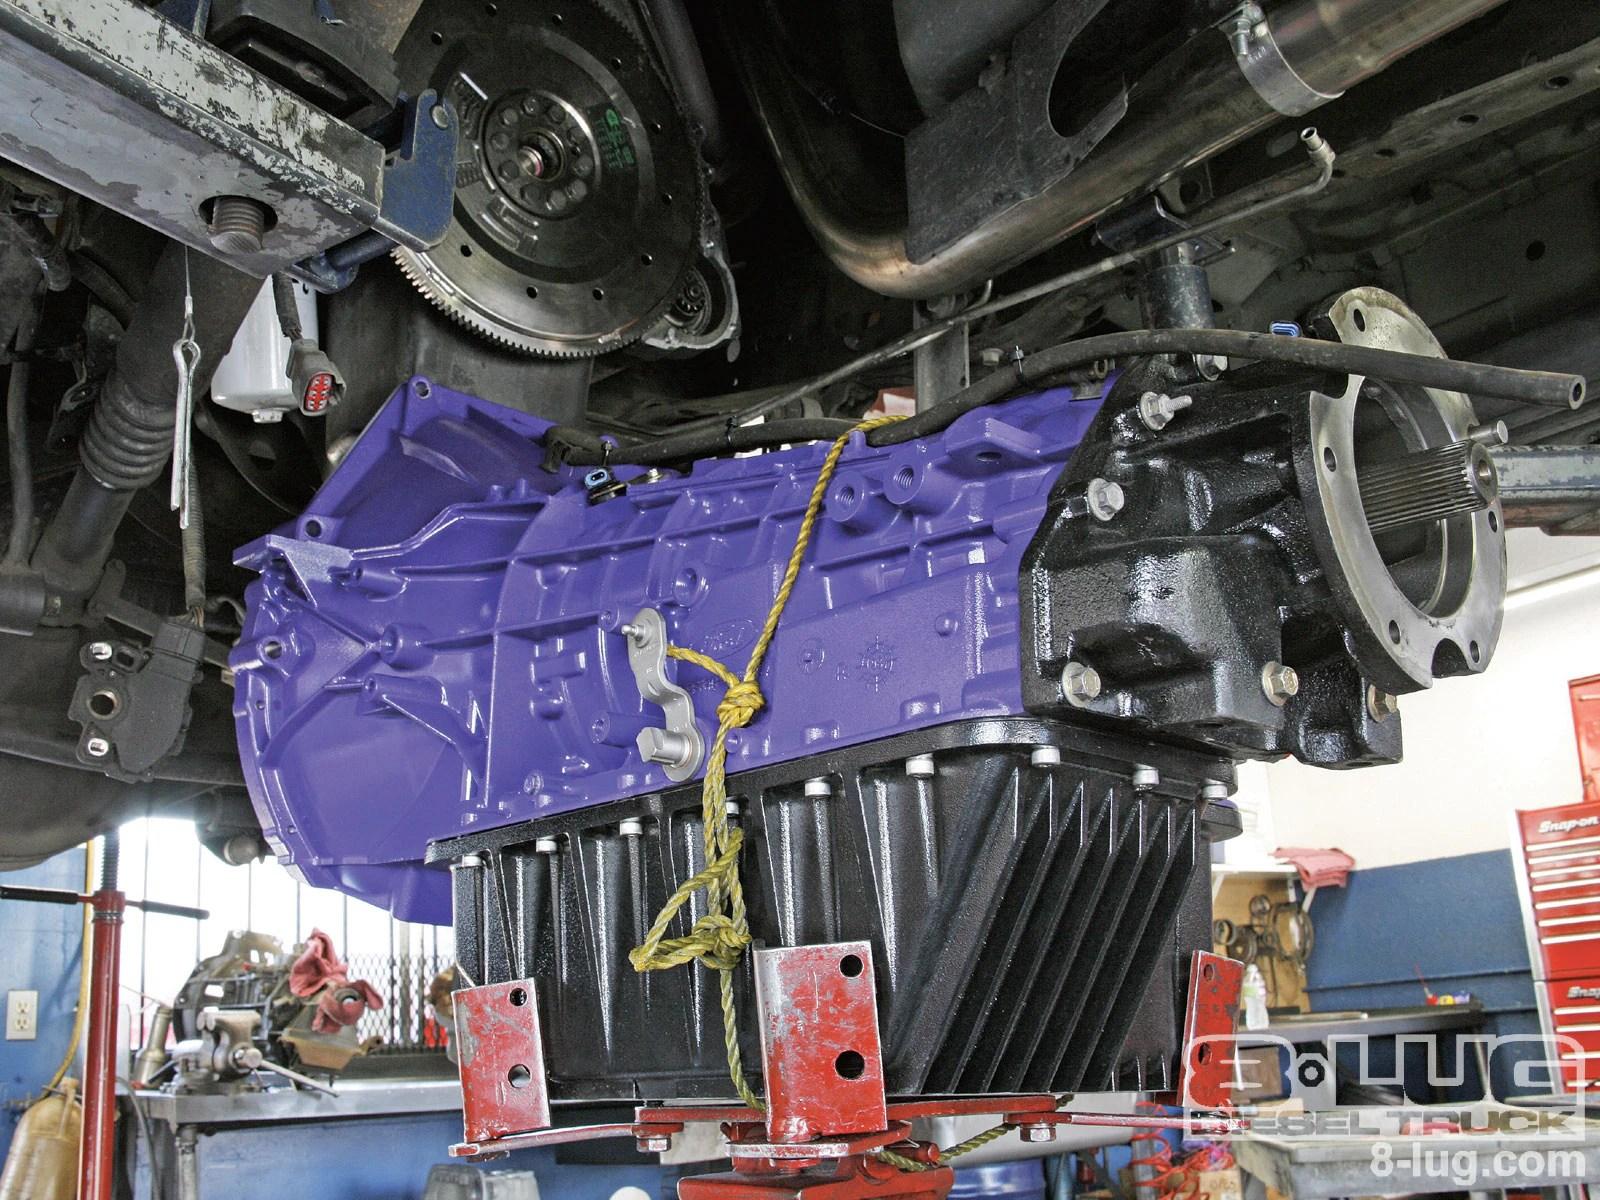 ford f350 transmission swap the big purple tranny photo gallery  [ 1600 x 1200 Pixel ]